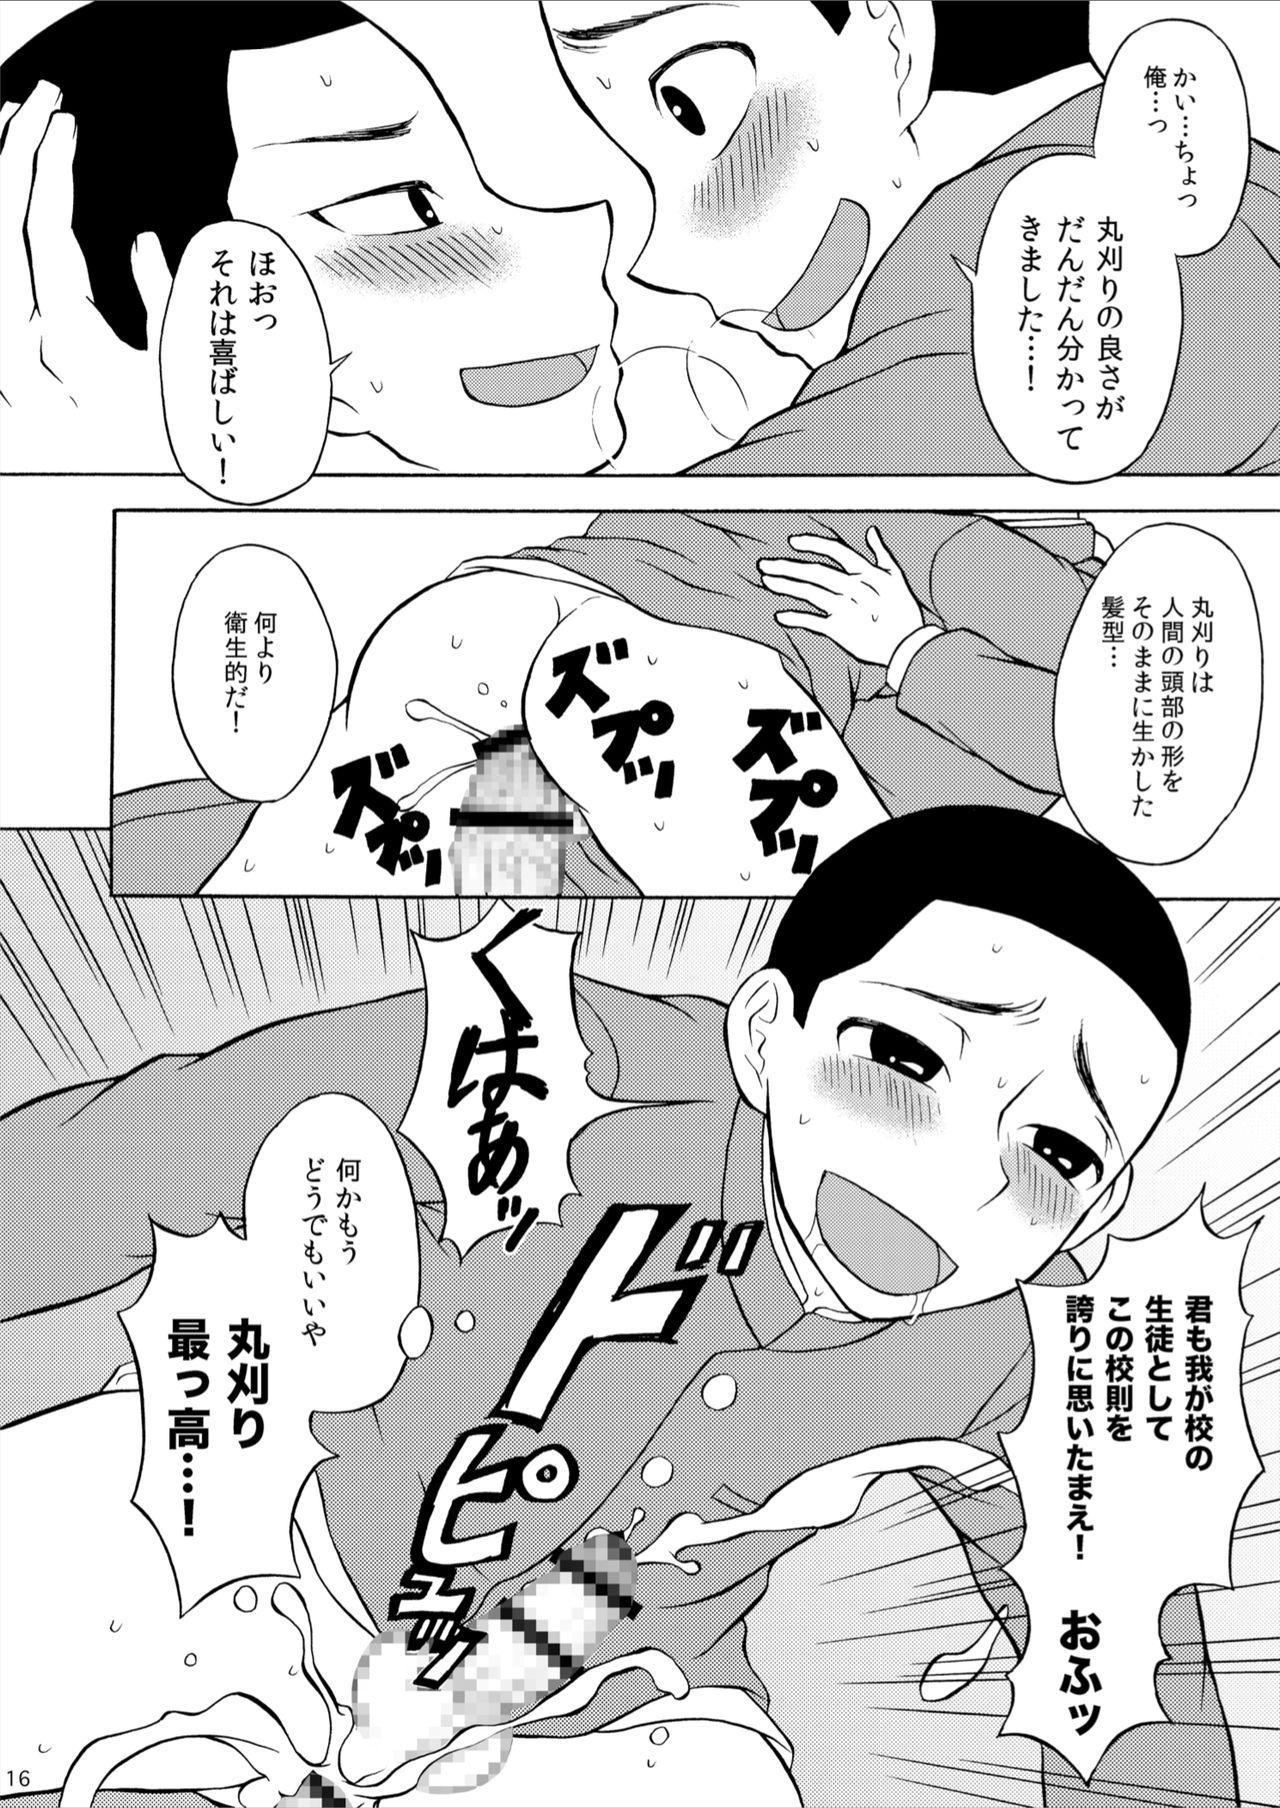 Marugari Jigokuhen 15